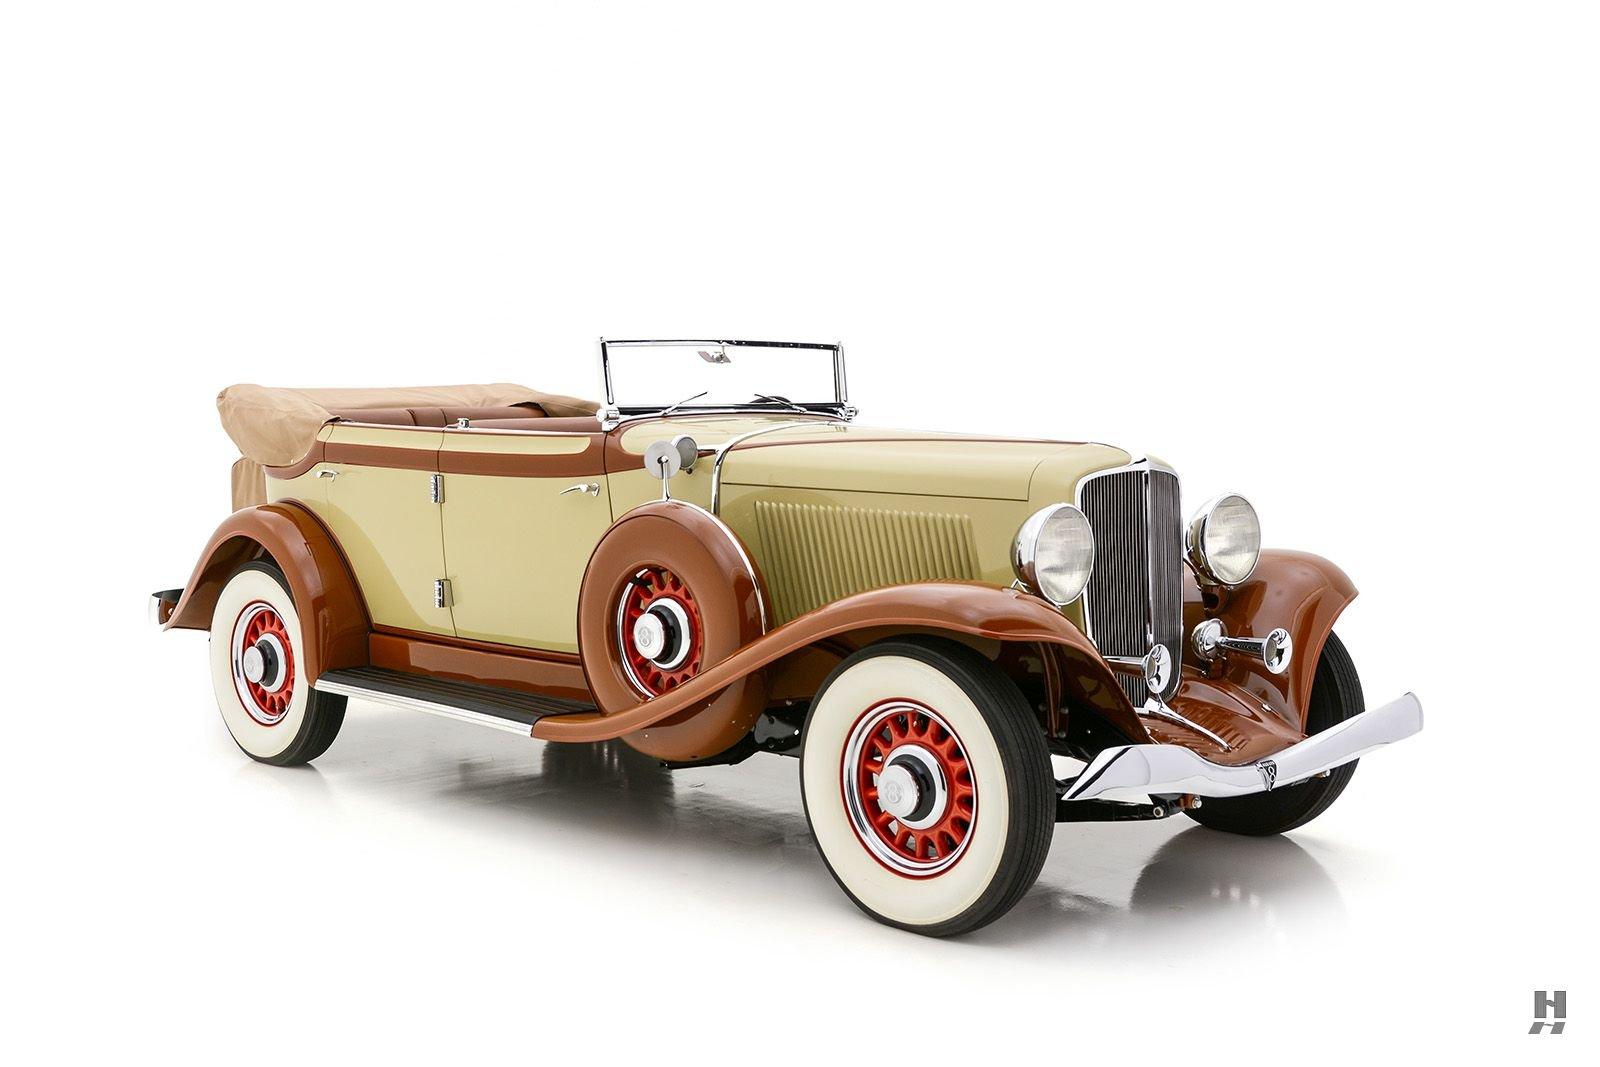 1933 auburn 8 105 salon